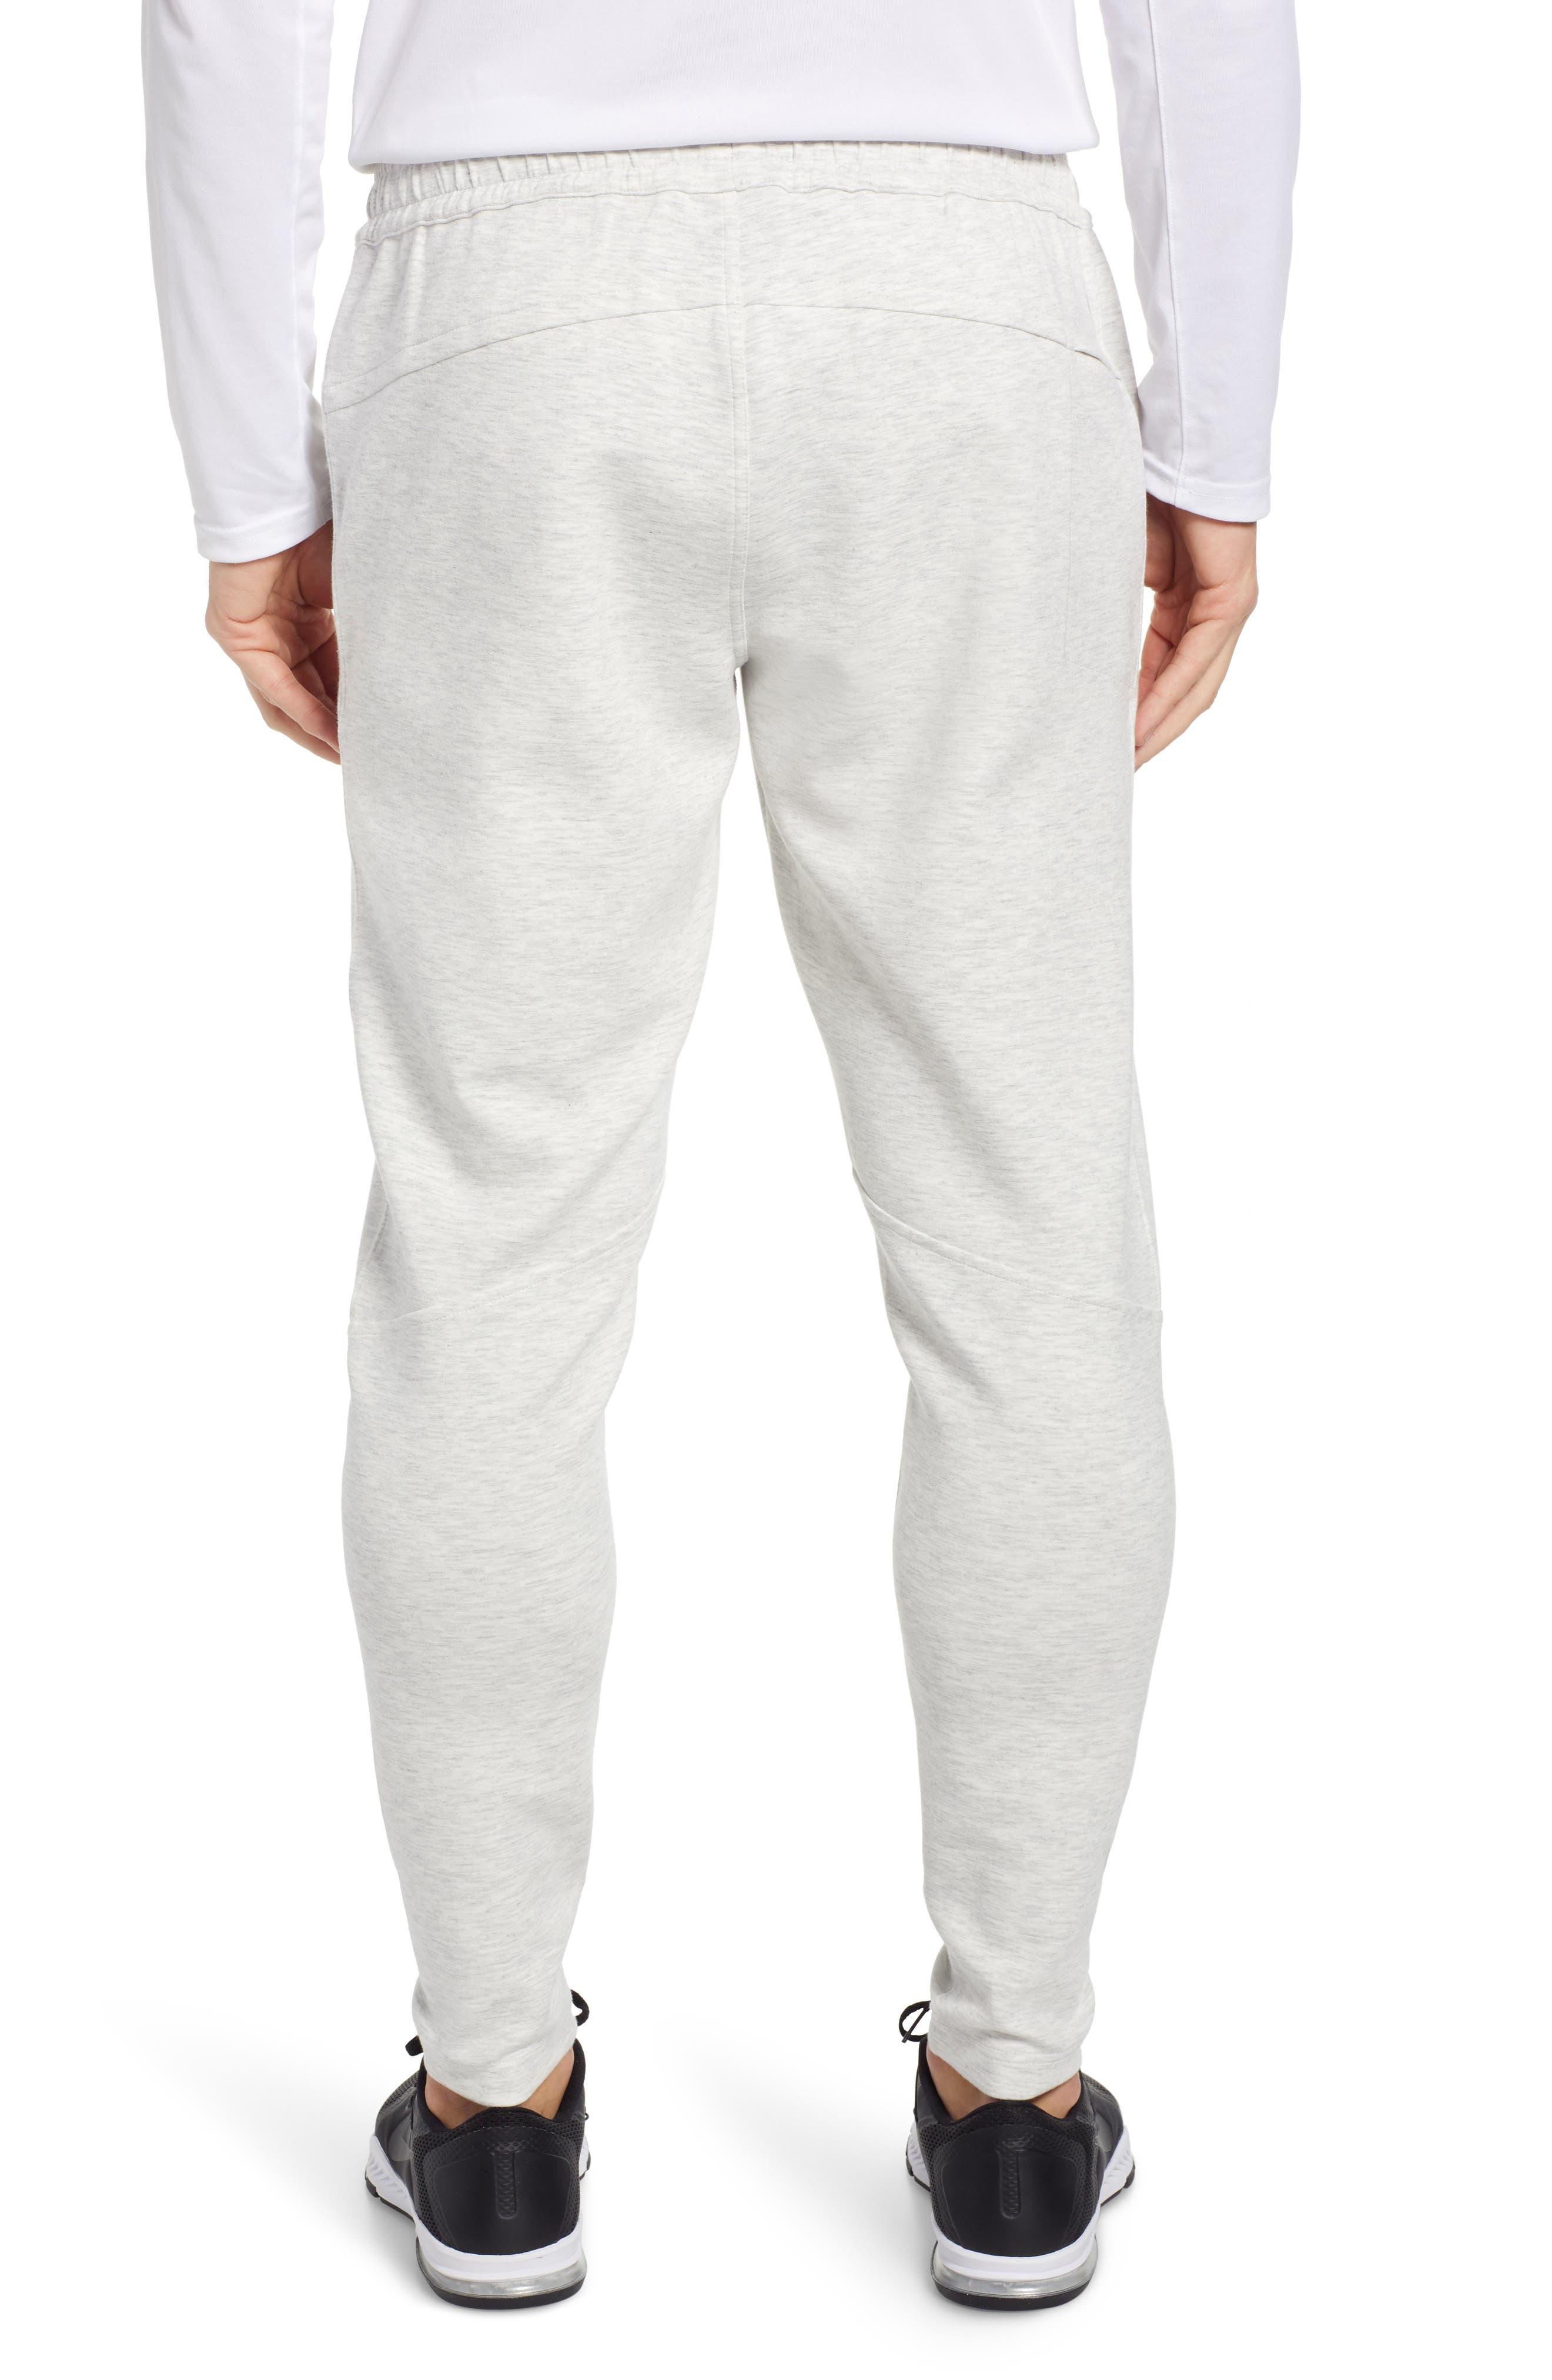 ZELLA, Zip Pocket Tech Jogger Pants, Alternate thumbnail 2, color, WHITE OXIDE MELANGE